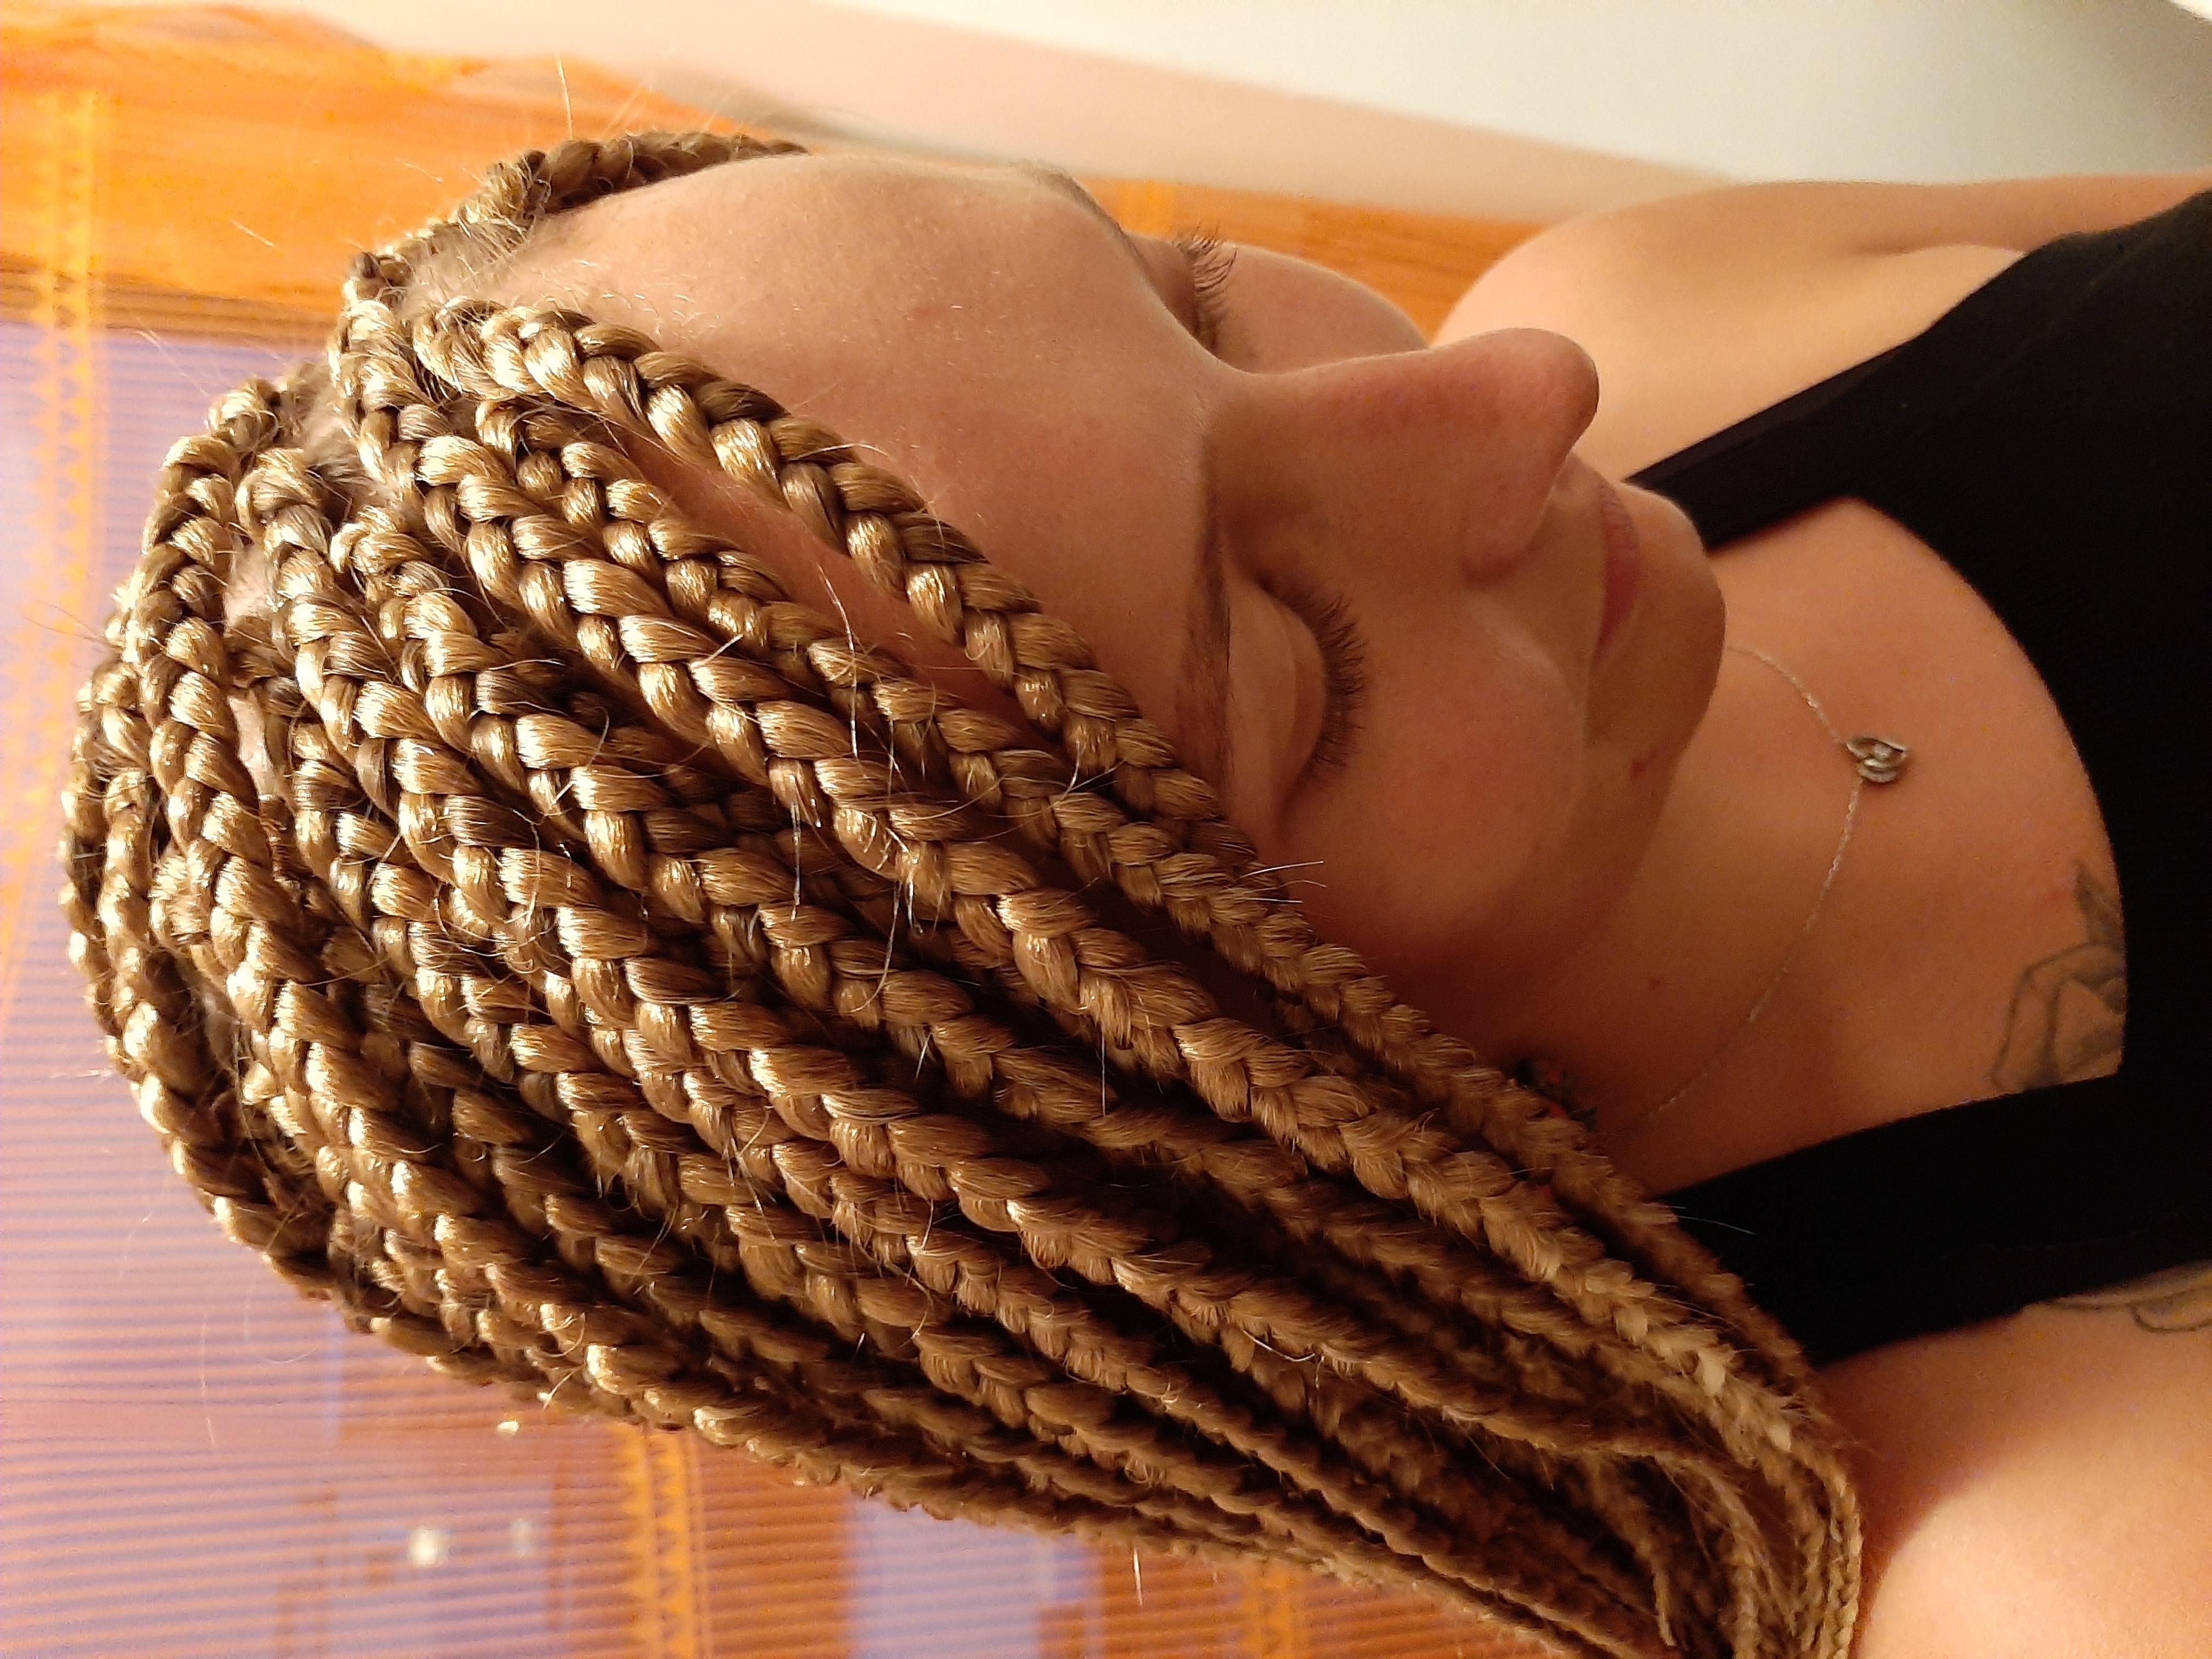 salon de coiffure afro tresse tresses box braids crochet braids vanilles tissages paris 75 77 78 91 92 93 94 95 YEERPNPF